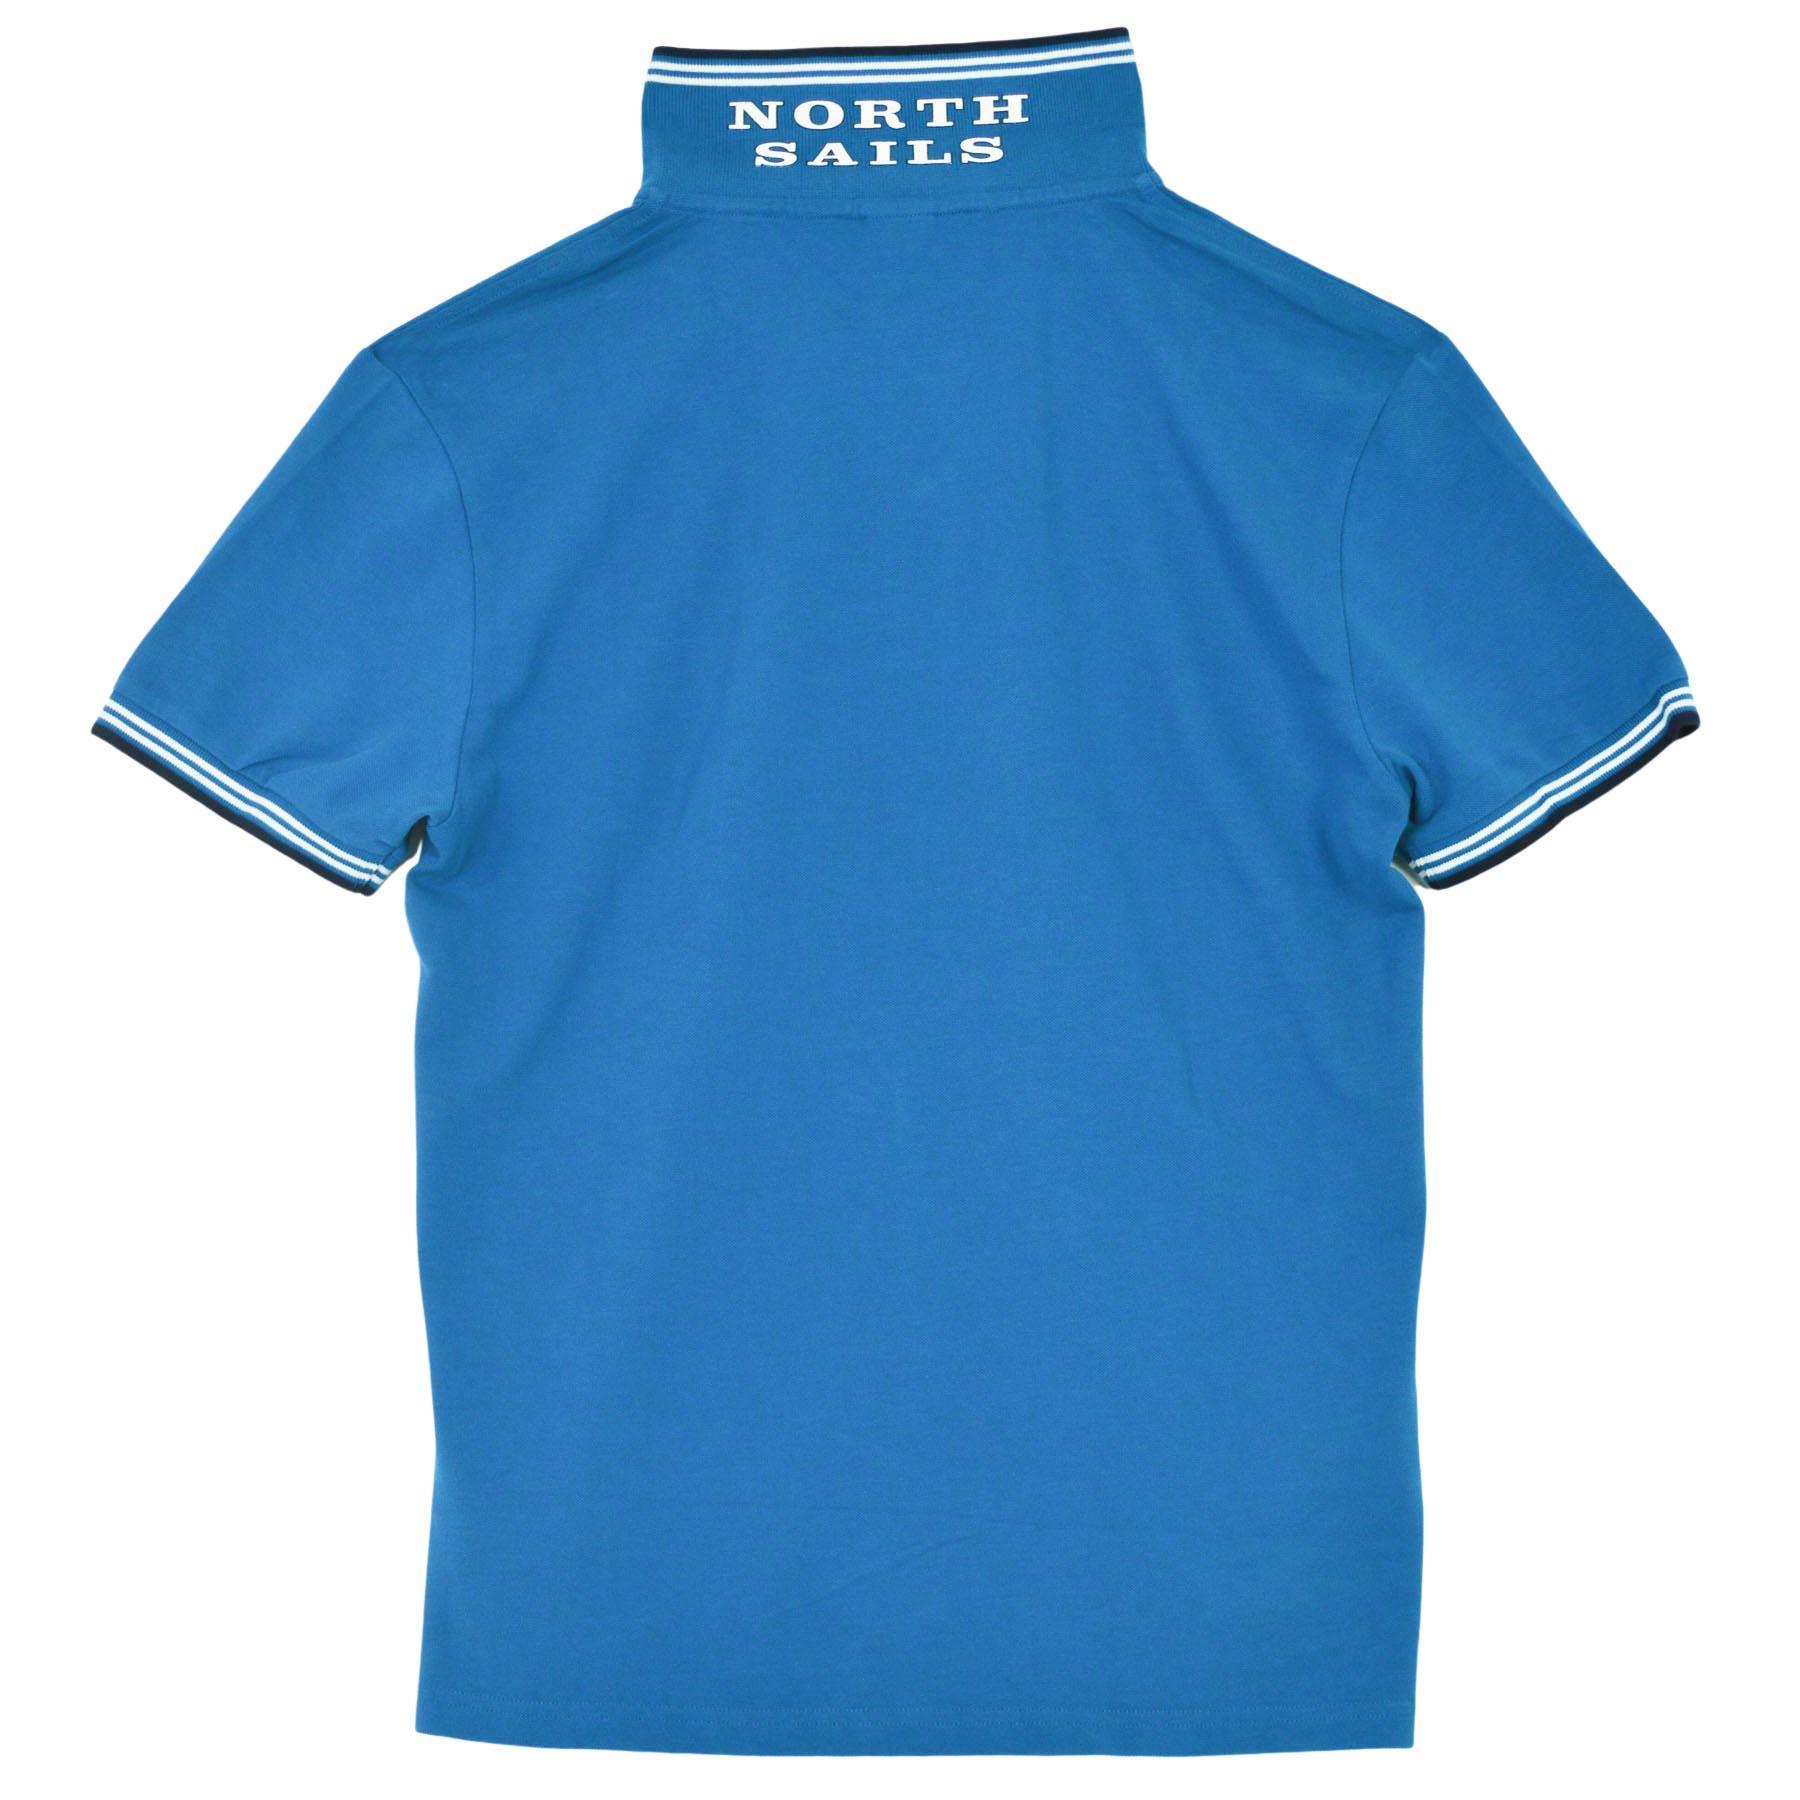 NEW-North-Sails-Legacy-Heritage-Mens-Cotton-Polo-Shirt-Top-Size-S-M-L-XL-XXL-3XL thumbnail 16